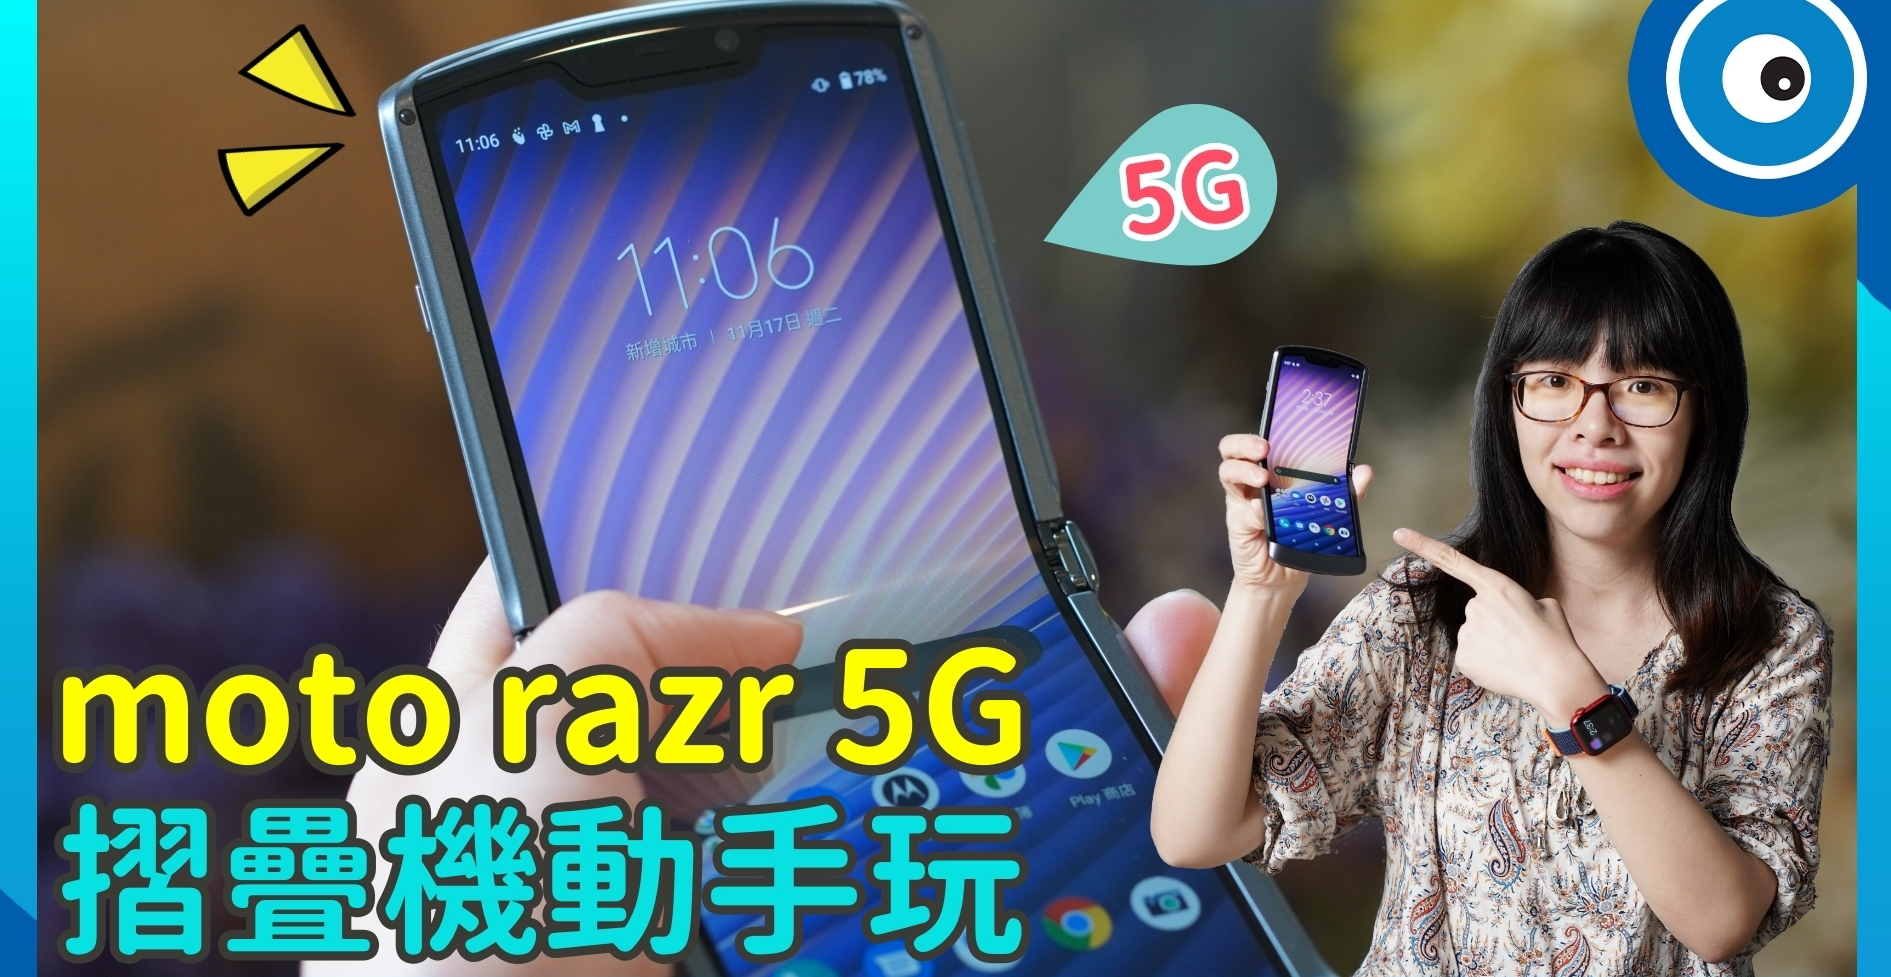 Motorola 在台灣推出摺疊機「Moto razr」,復刻過去 Motorola V3 刀鋒機的外型,內裝則是升級今年熱門的 5G 網路。